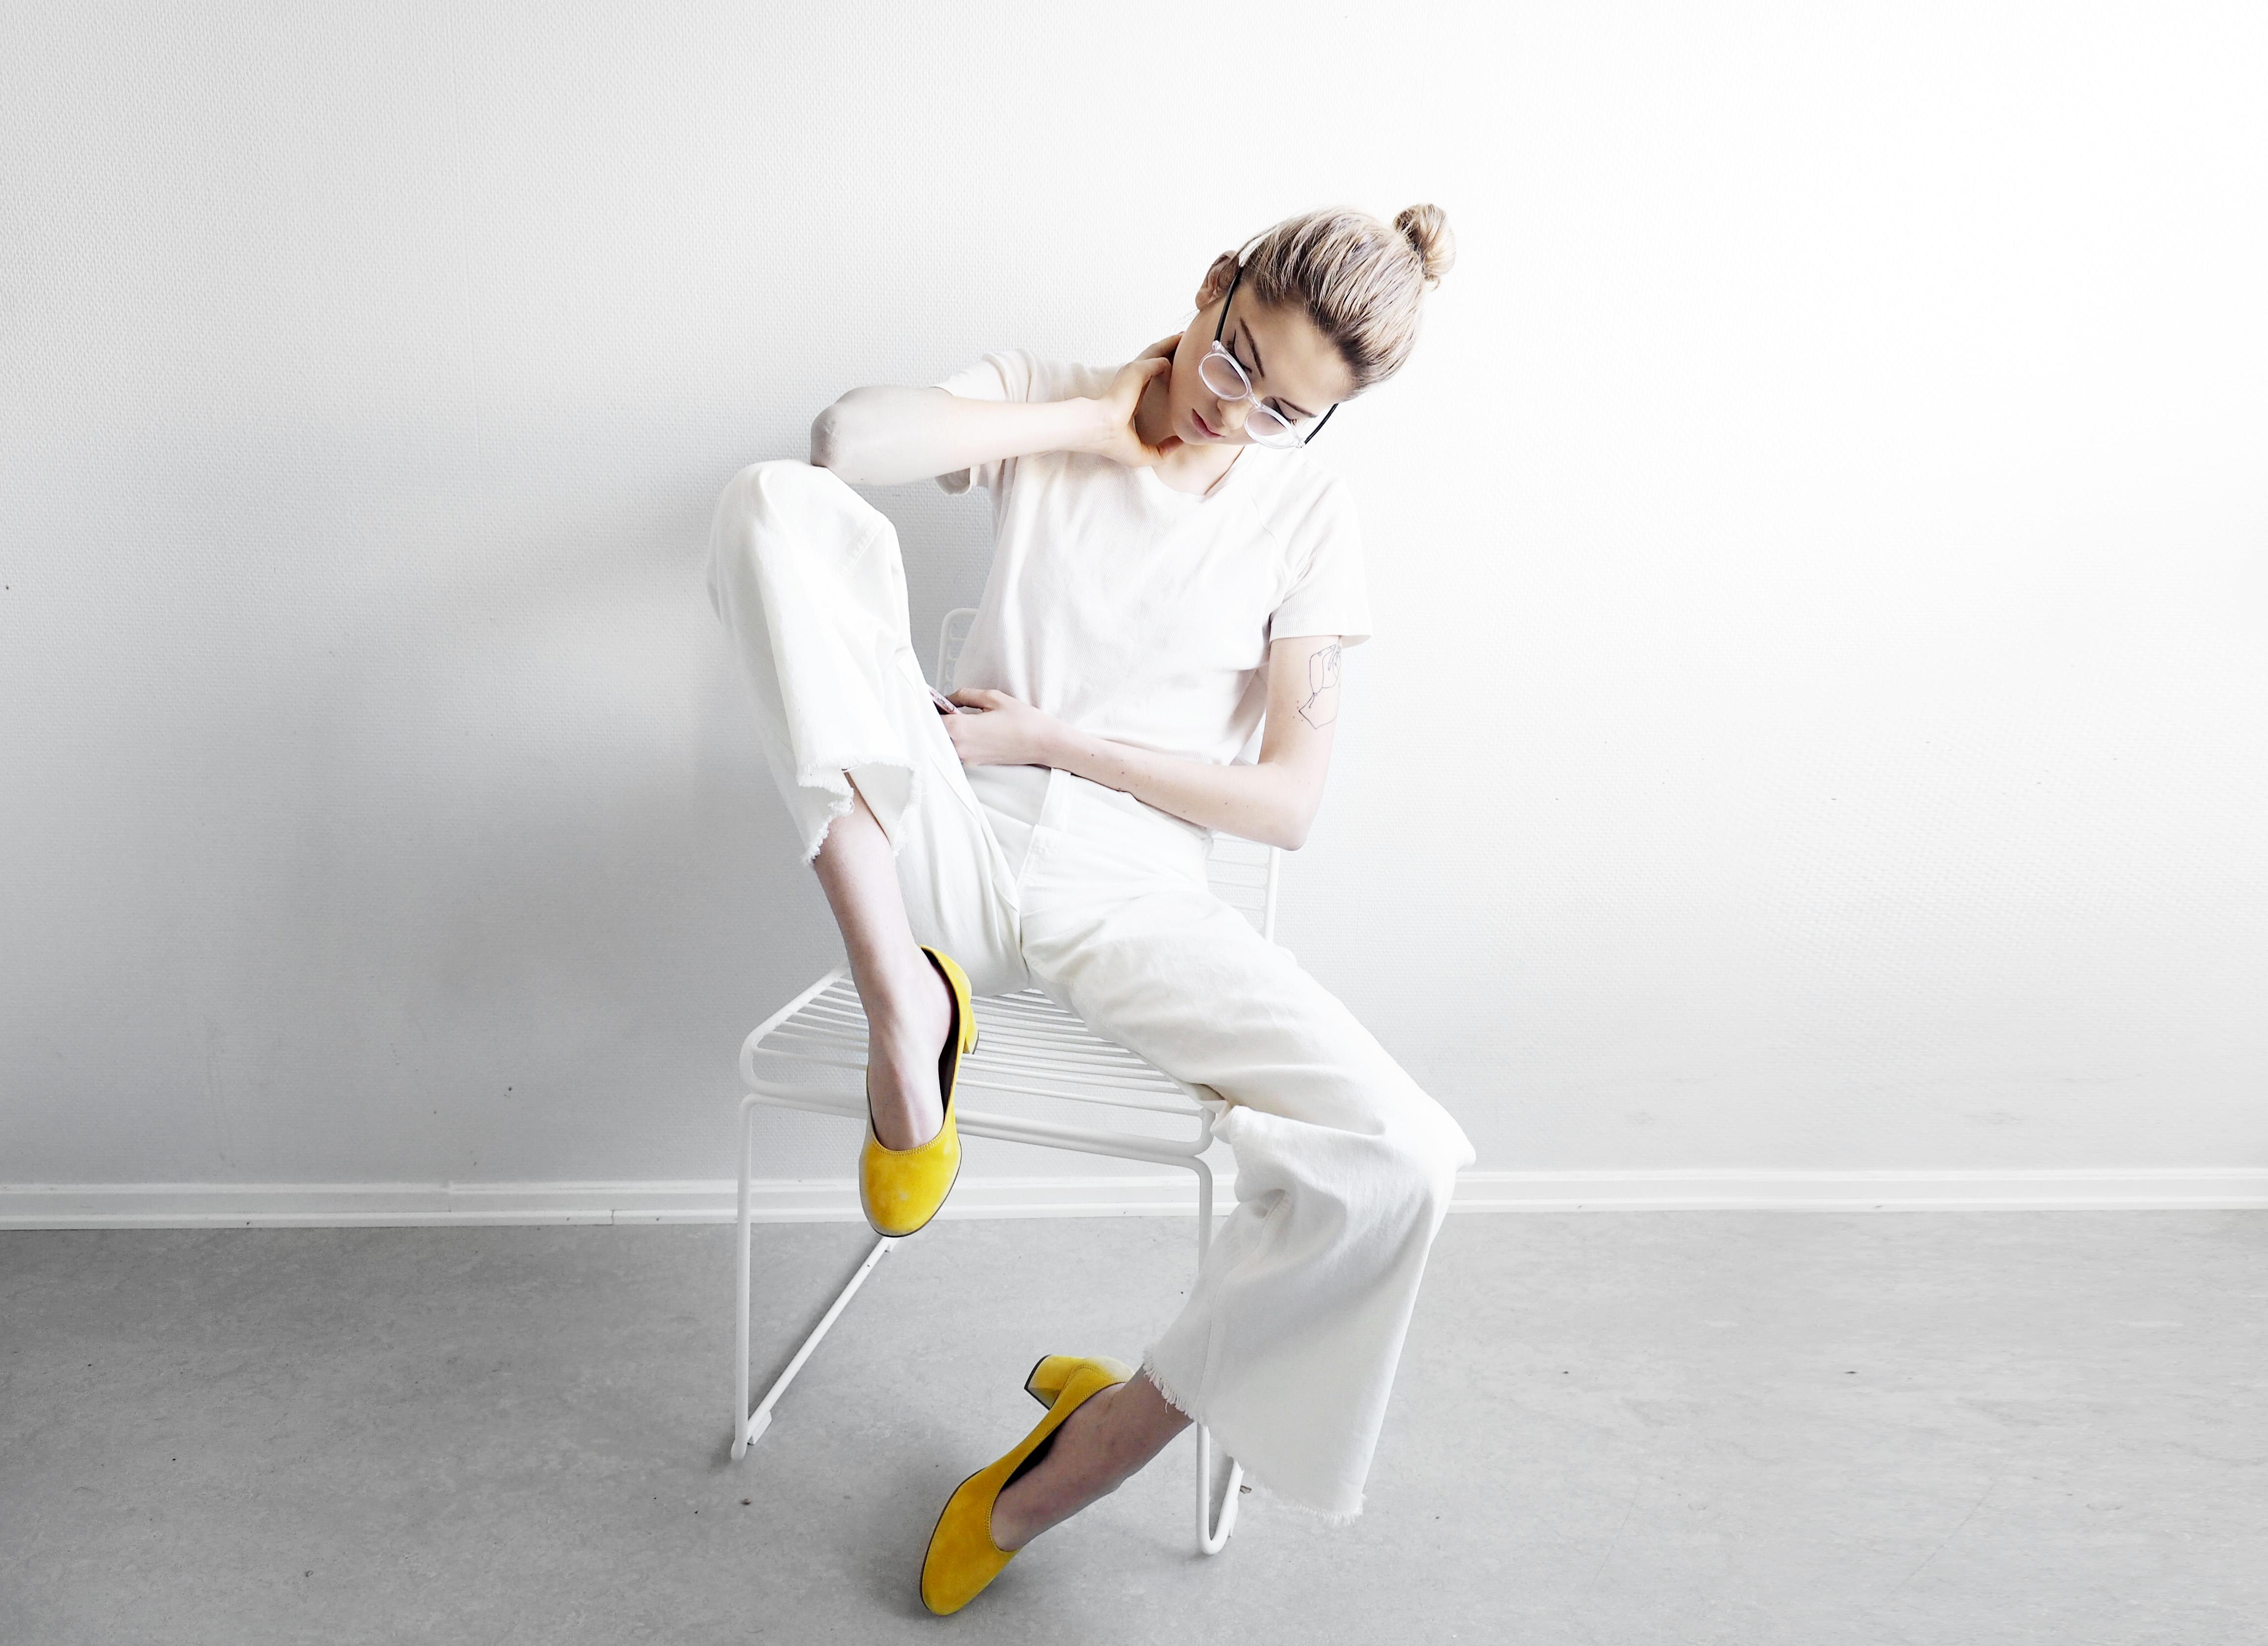 Shoes- Made by sarenza, pants- Monki, top- Ragdoll, glasses- GlassesUSA